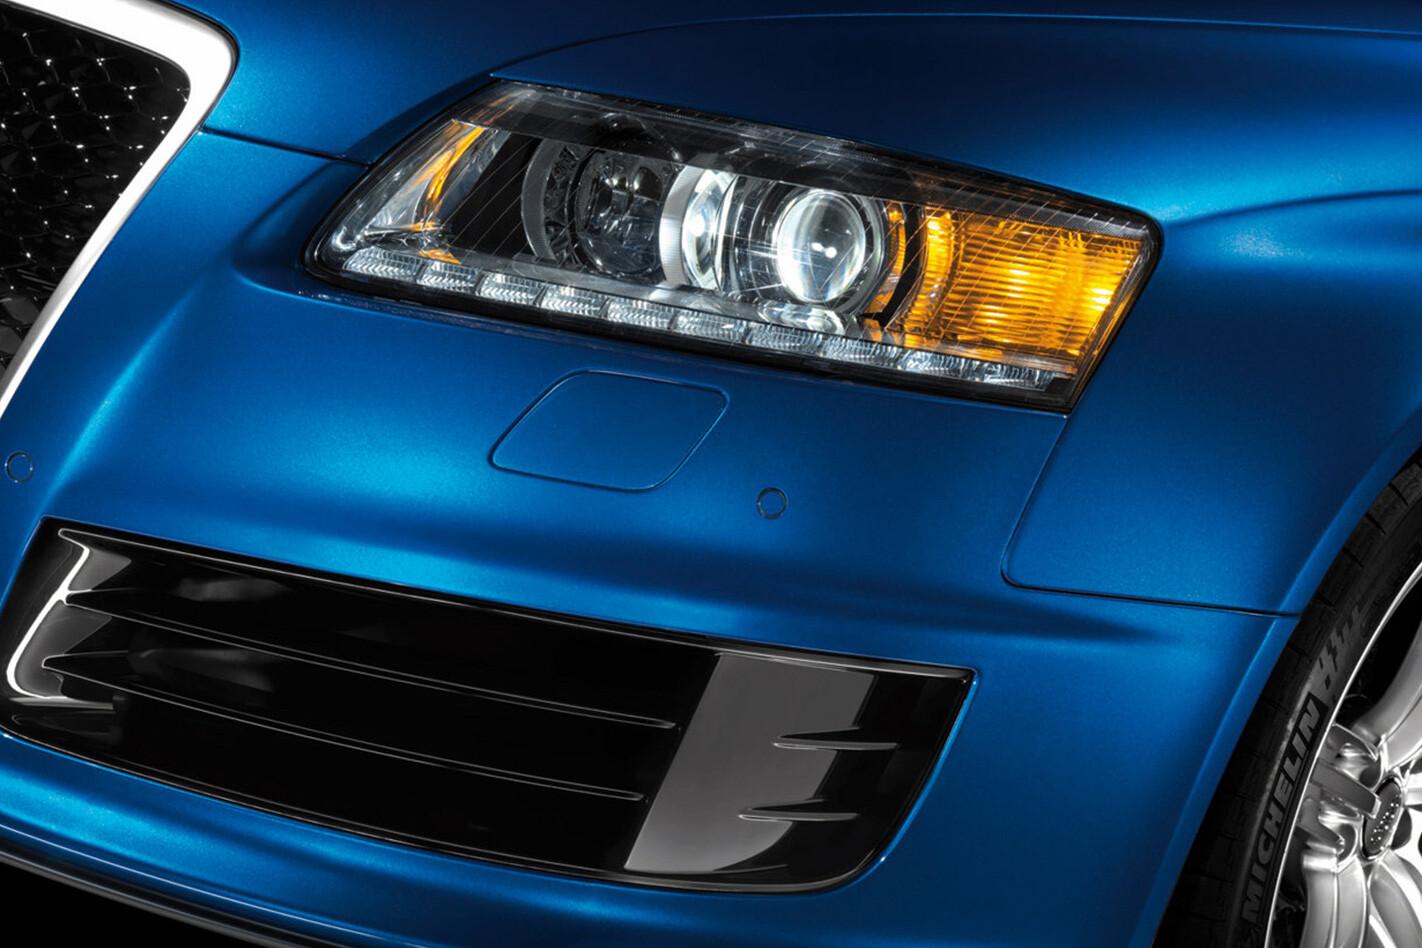 2008 Audi RS6 Avant headlight